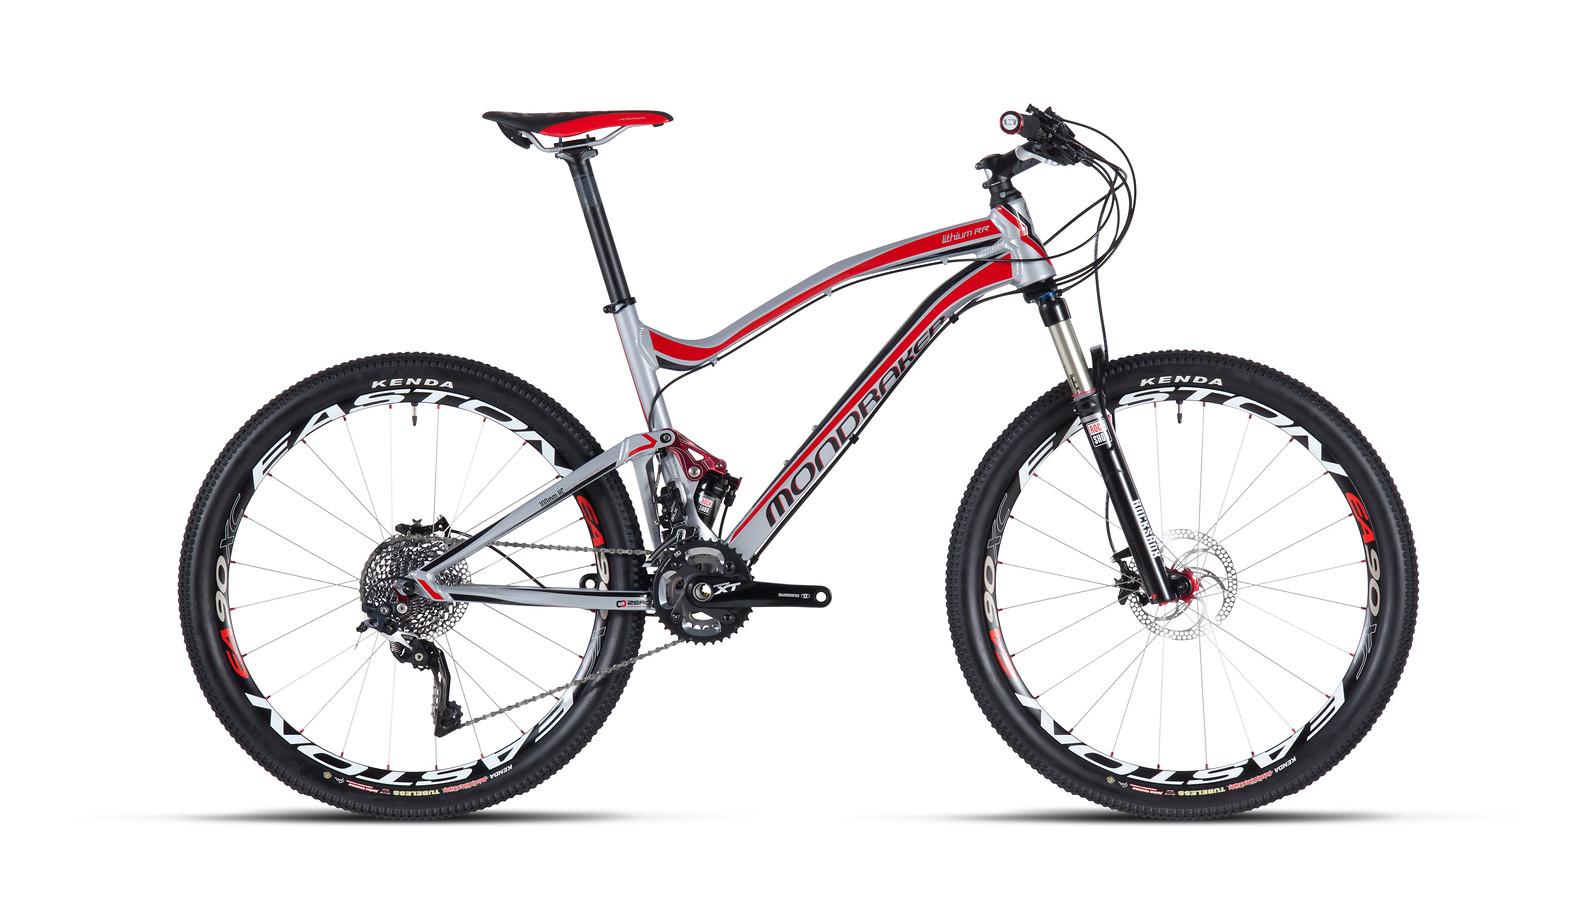 2013 Mondraker Lithium RR Bike bike - mondraker lithium rr